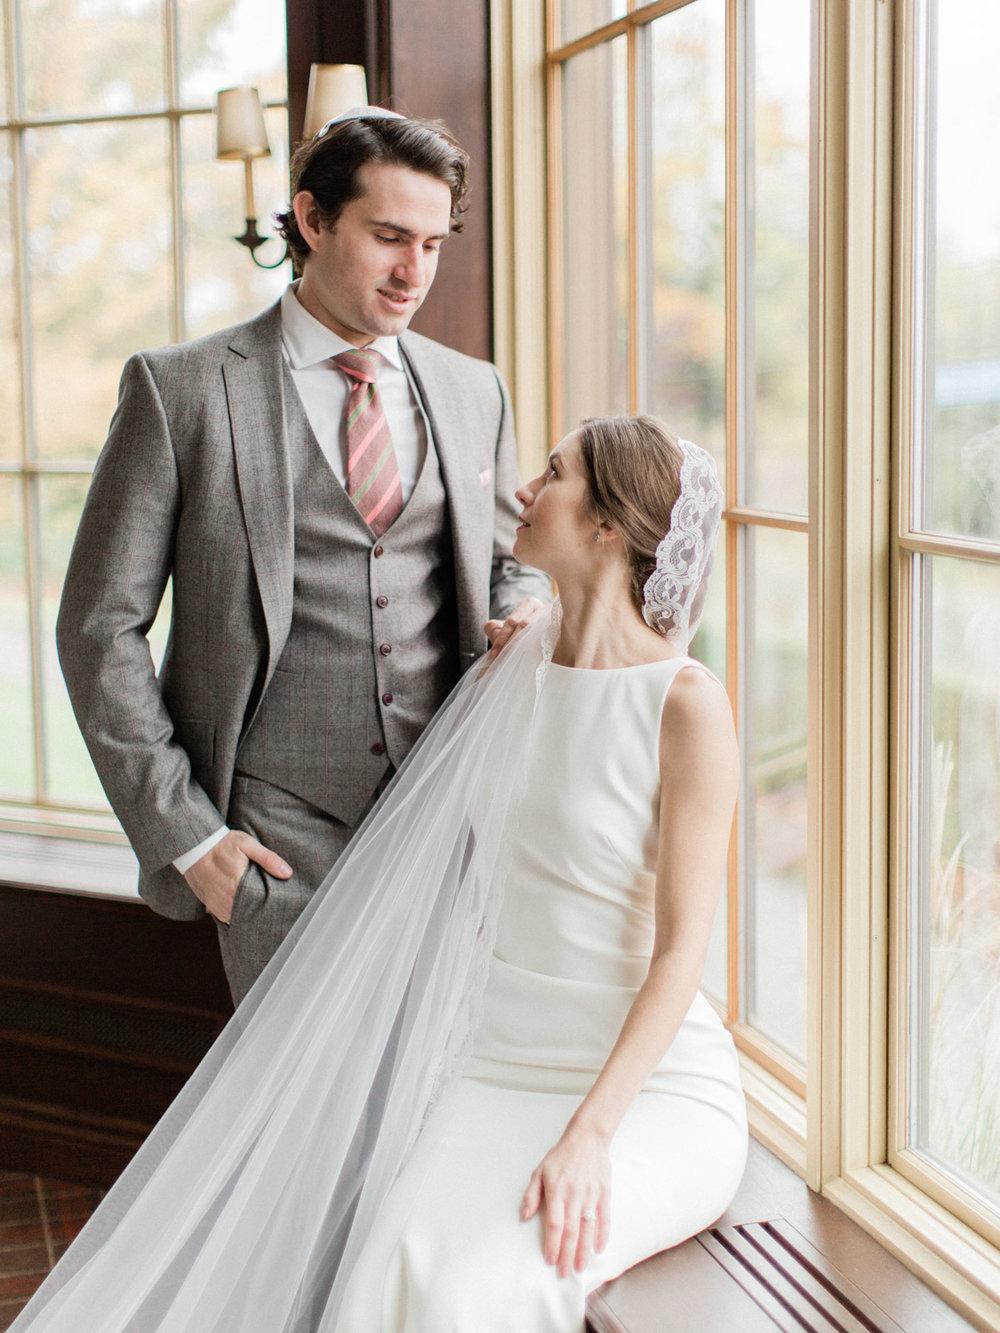 Toronto-wedding-photographer-st-georges-golf-club-jewish-modern-fall40.jpg